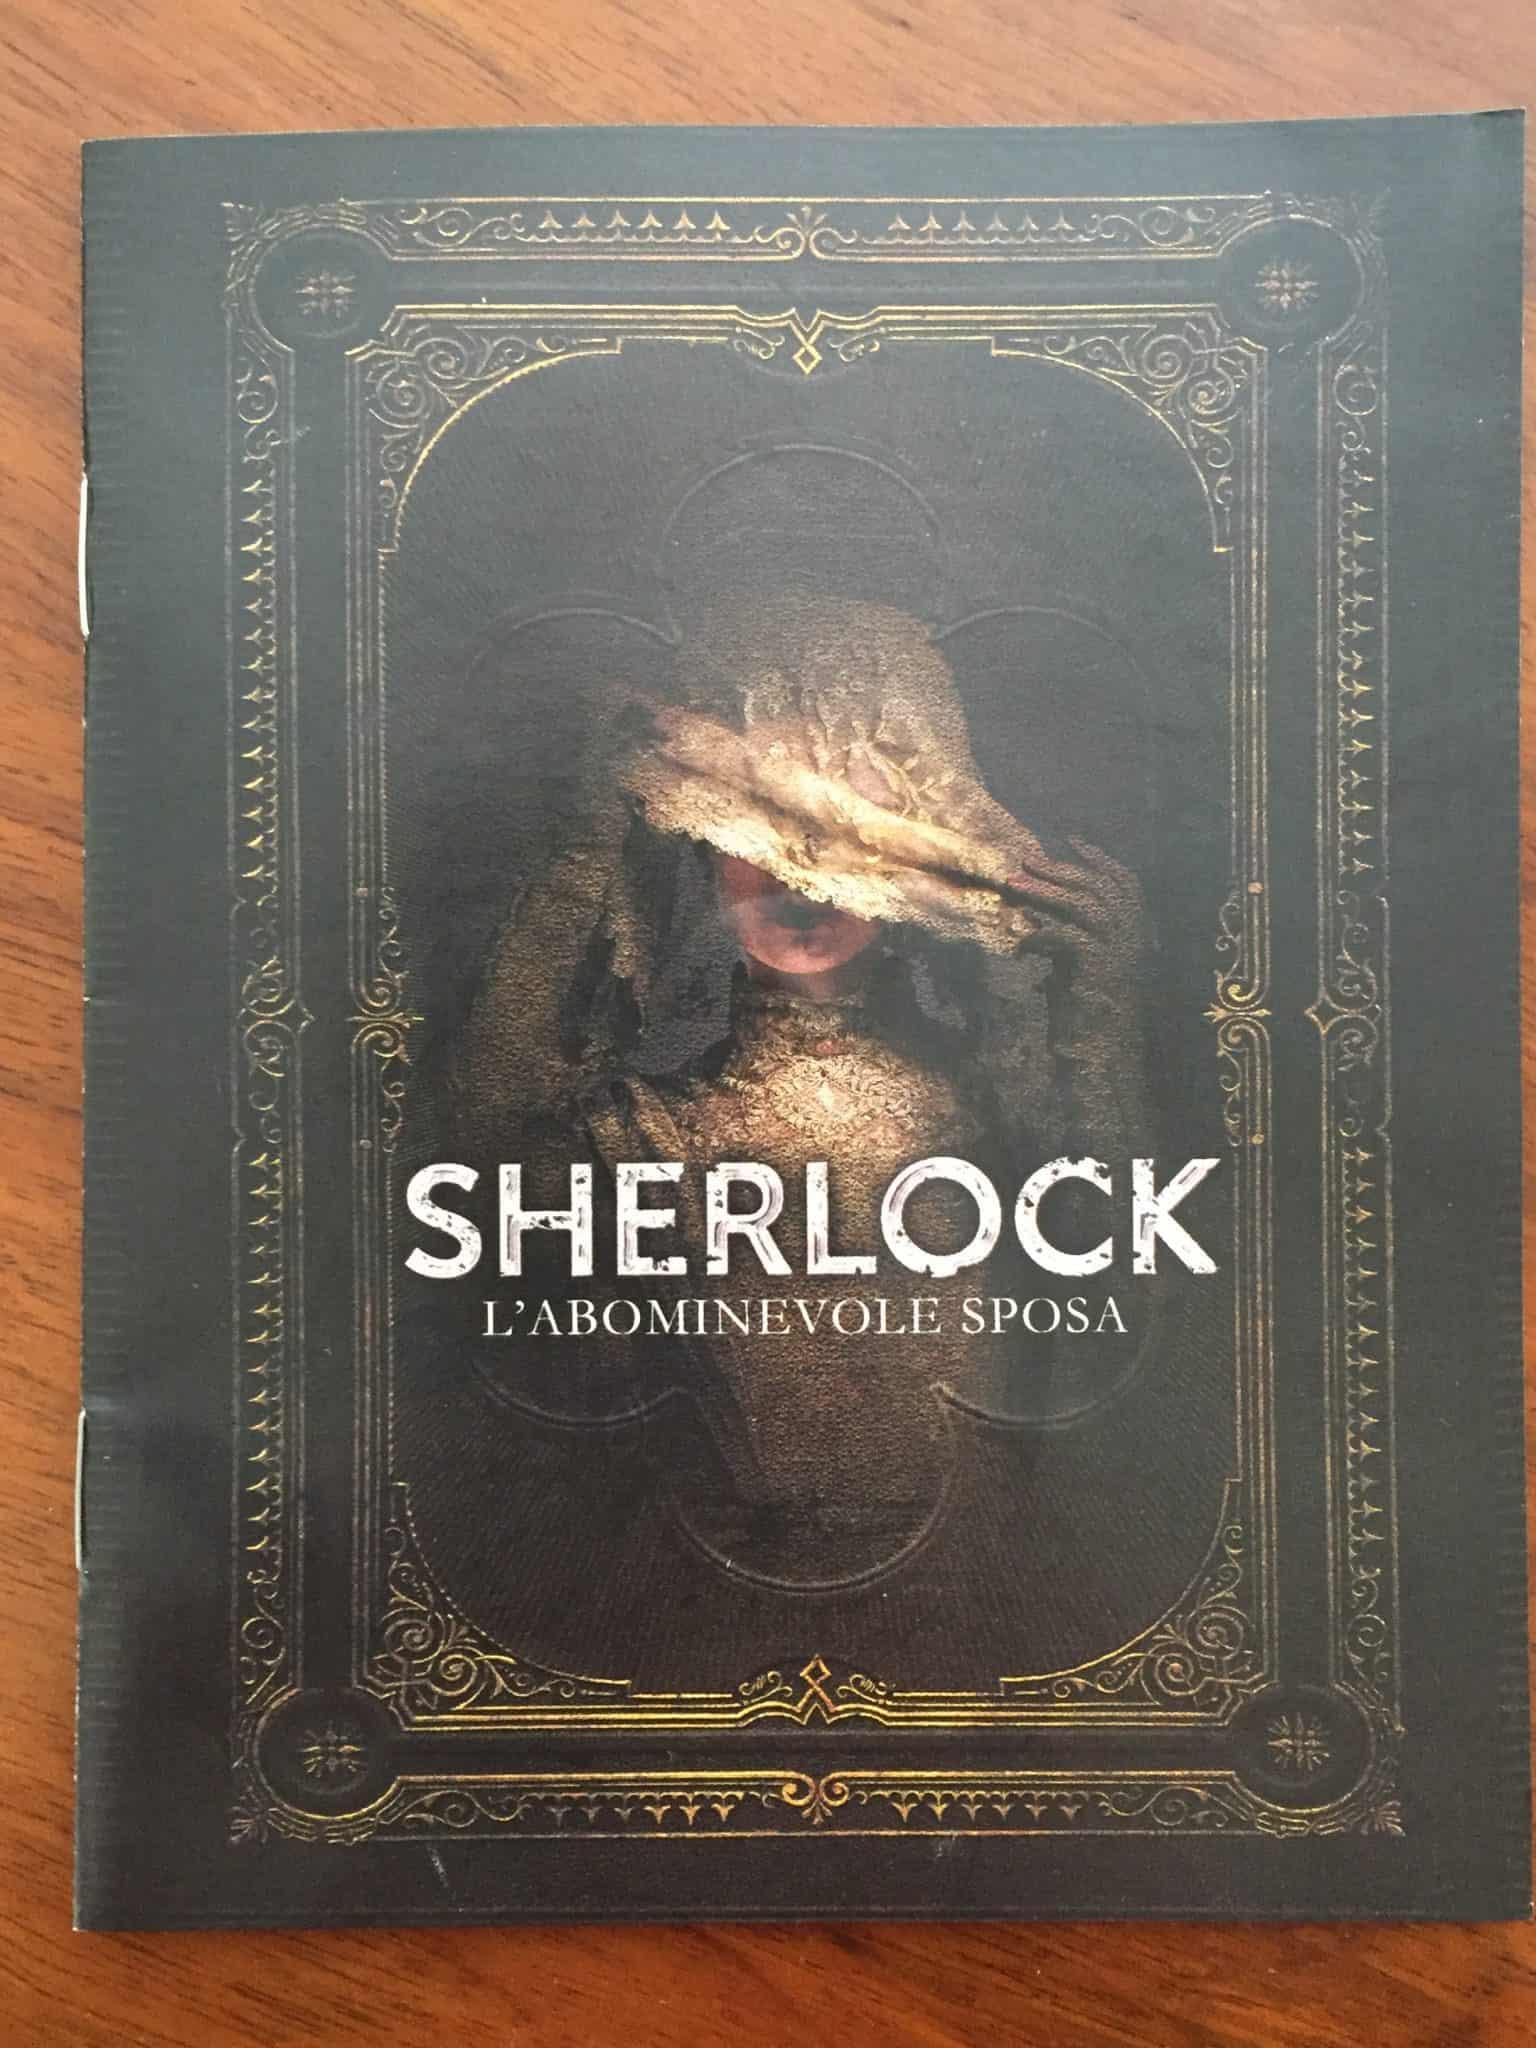 Booklet Sherlock l'abominevole sposa